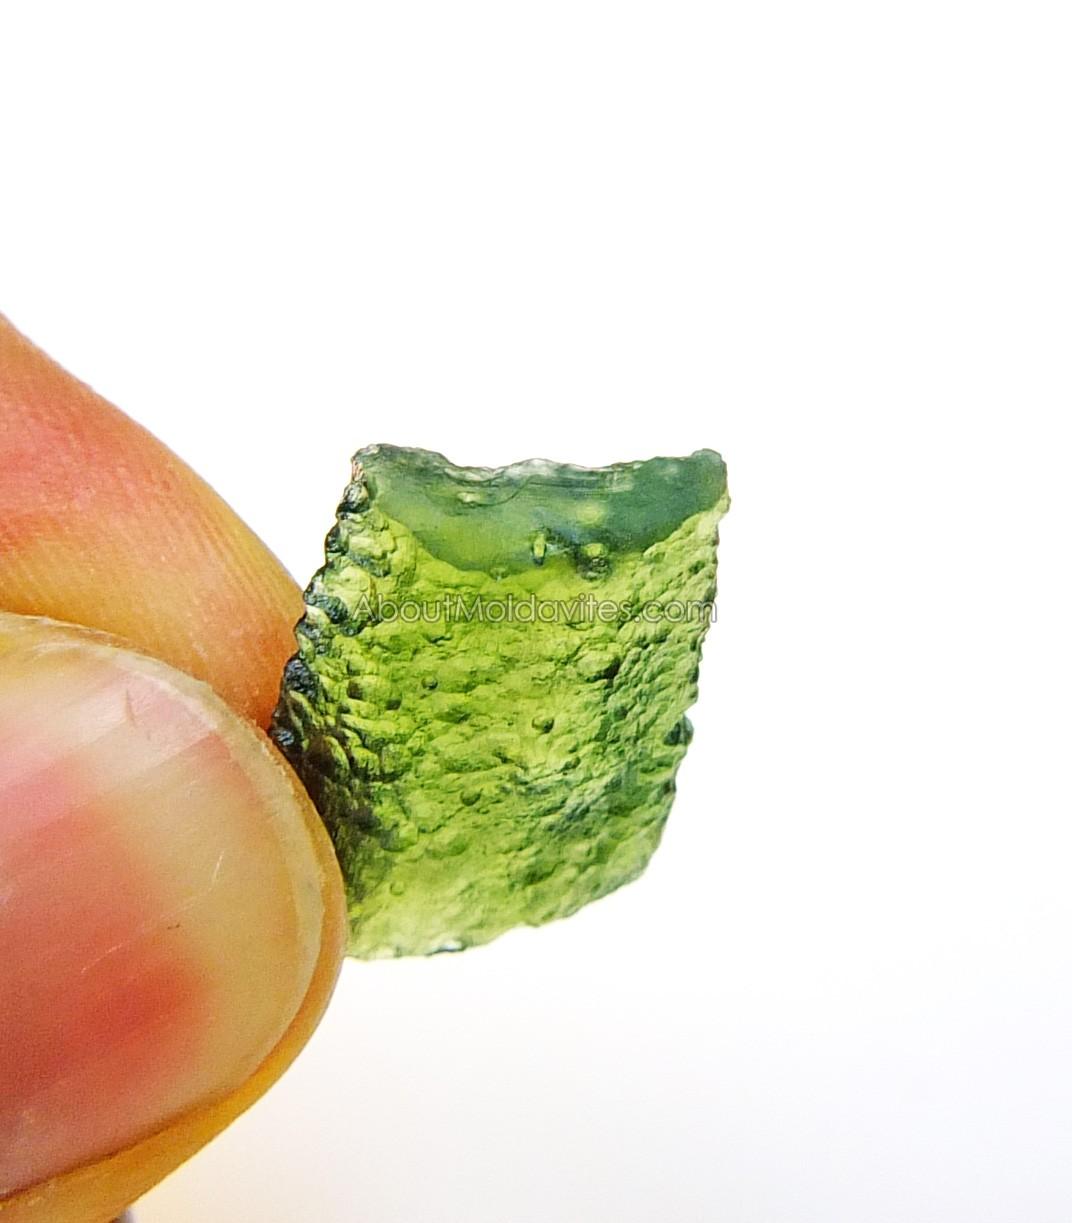 Etched damaged moldavite (without grinded texture)